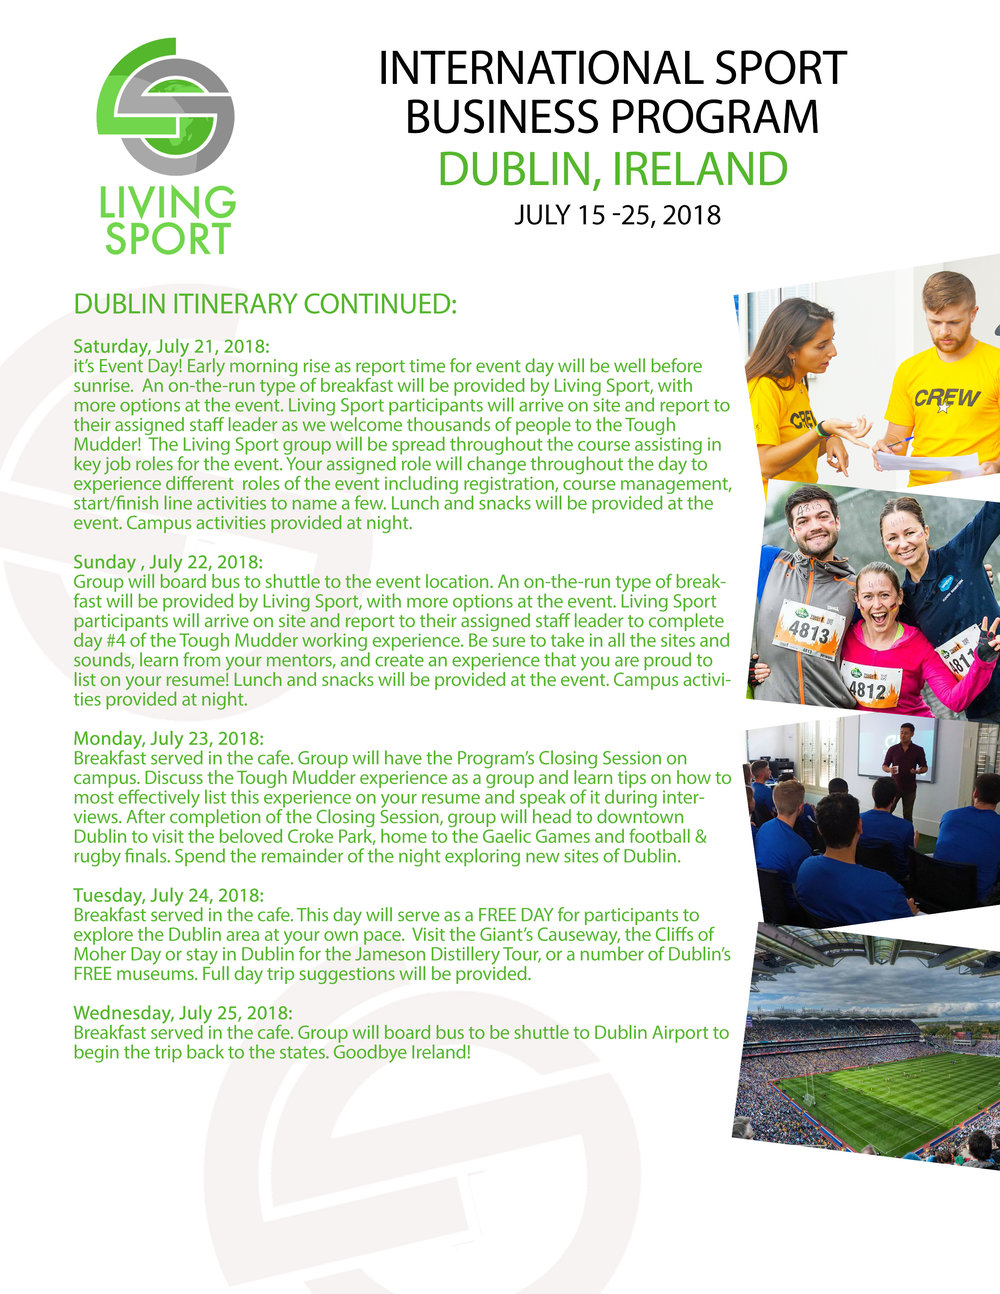 Living Sport Itinerary p2 - Dublin 2018.jpg